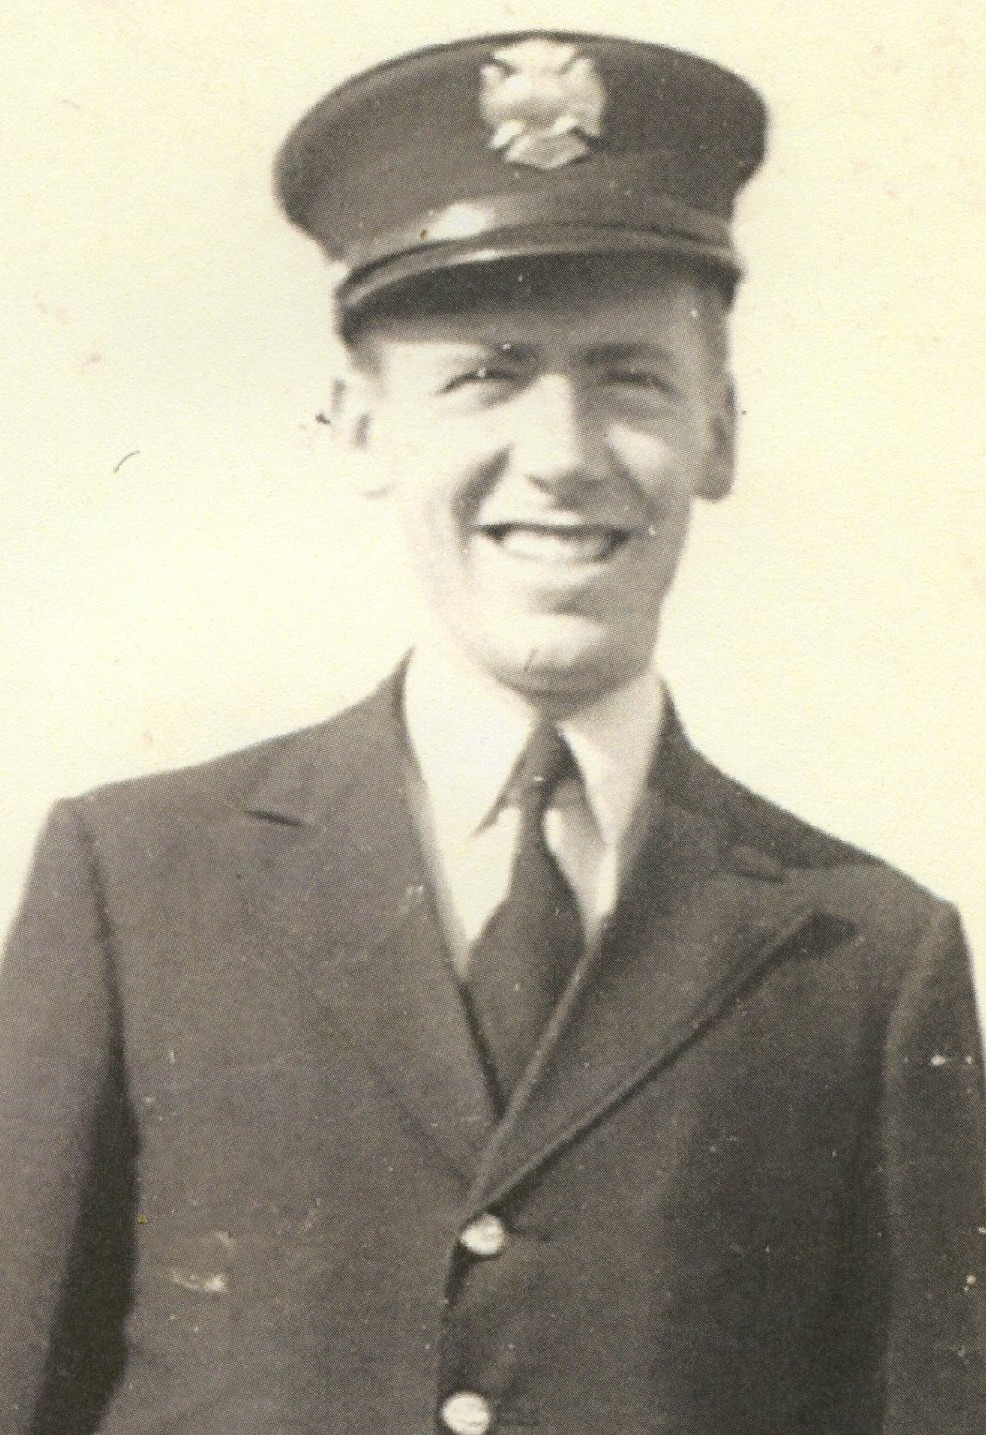 J H Plunkett